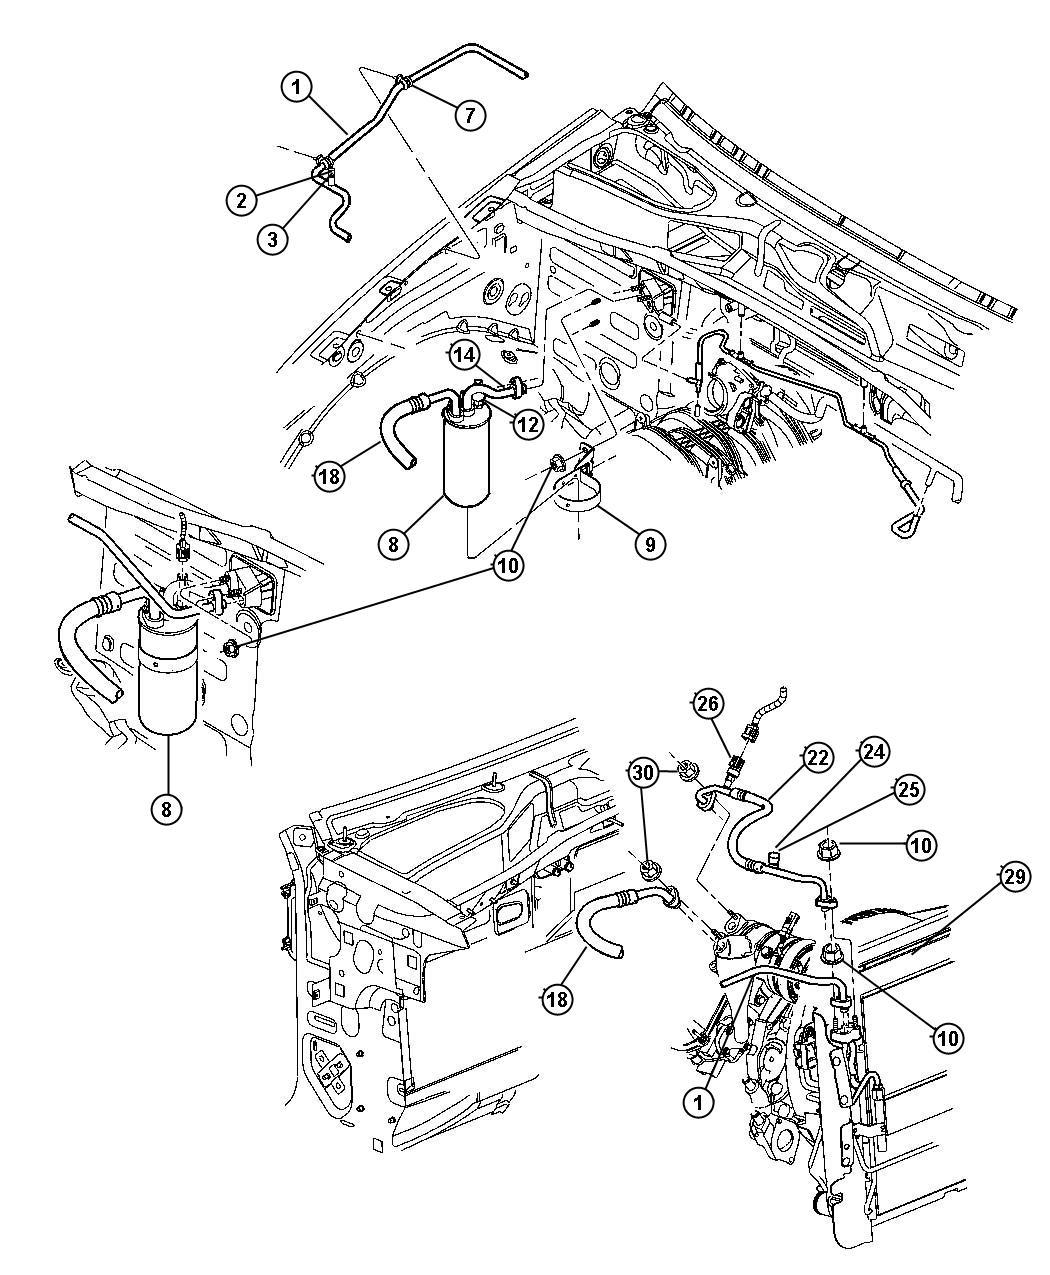 2005 Jeep Liberty Condenser. Air conditioning. Mopar, note